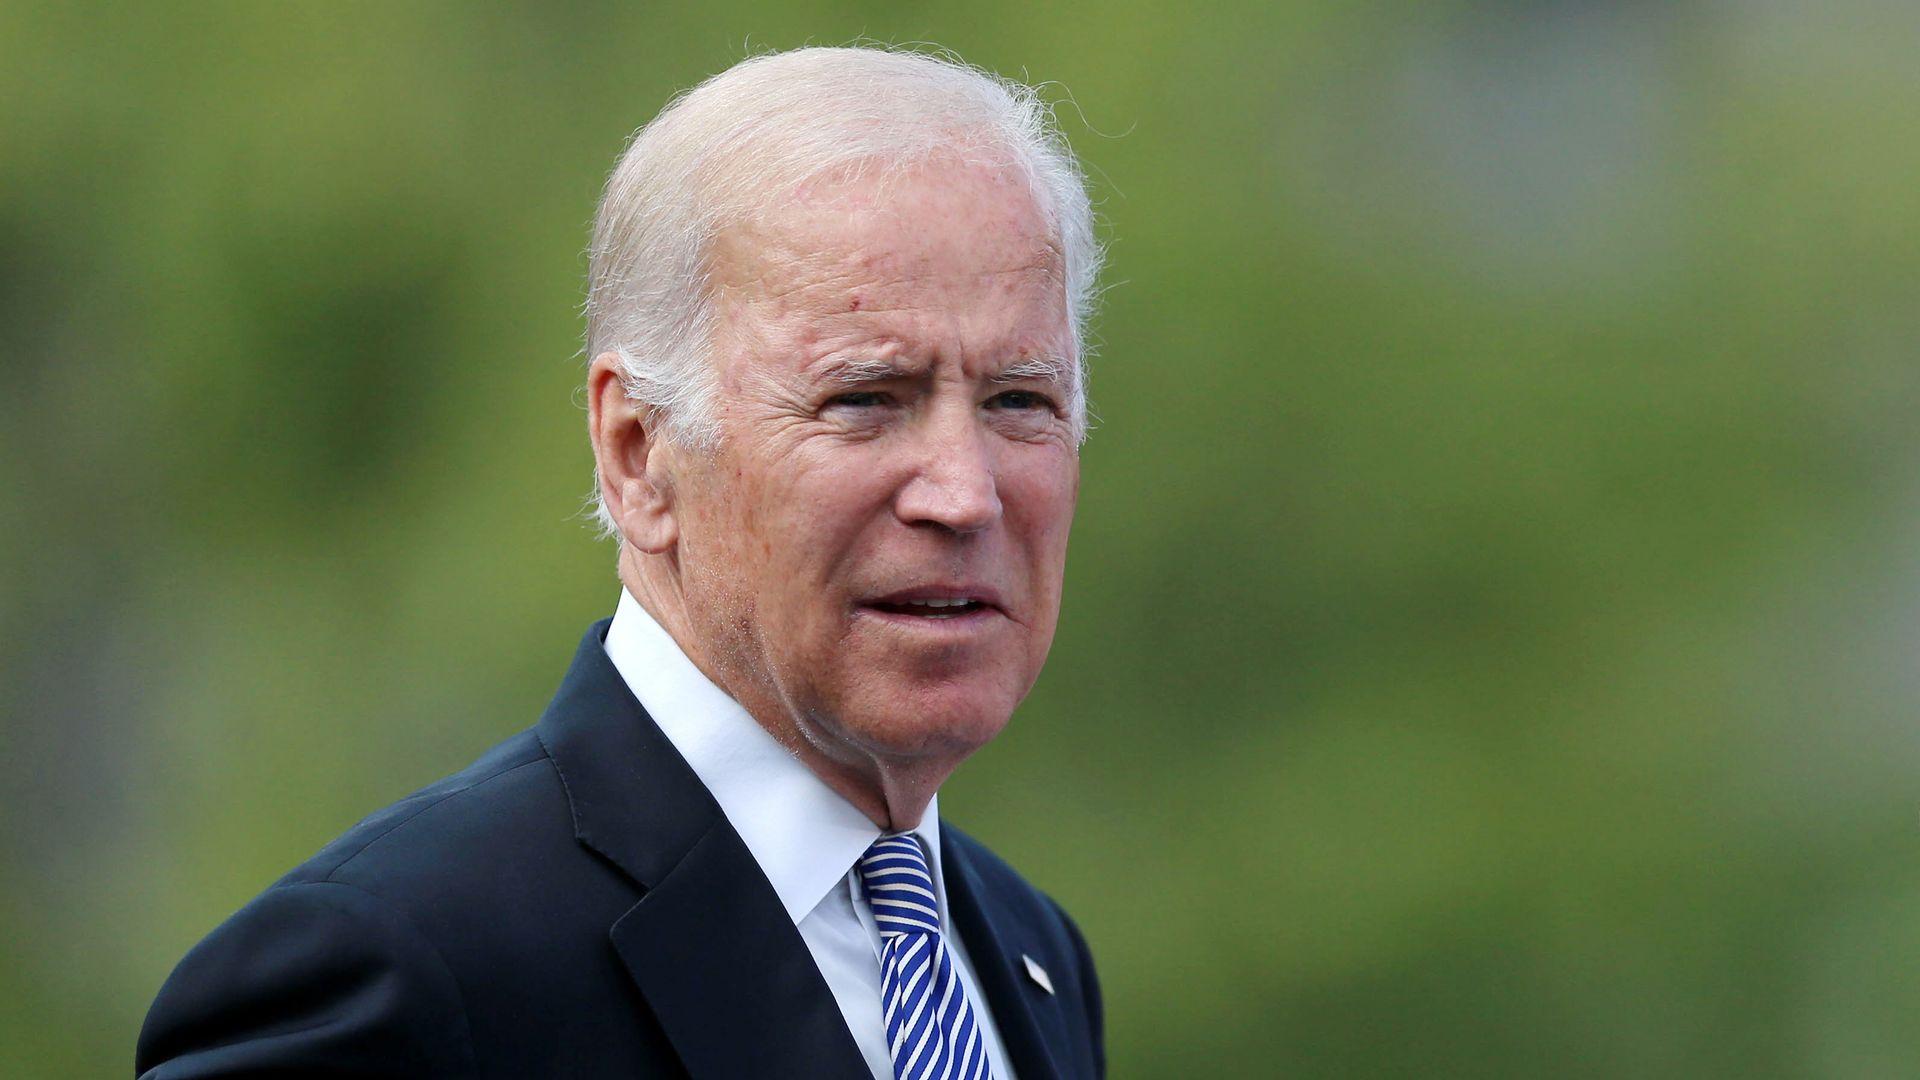 US president Joe Biden - Credit: PA